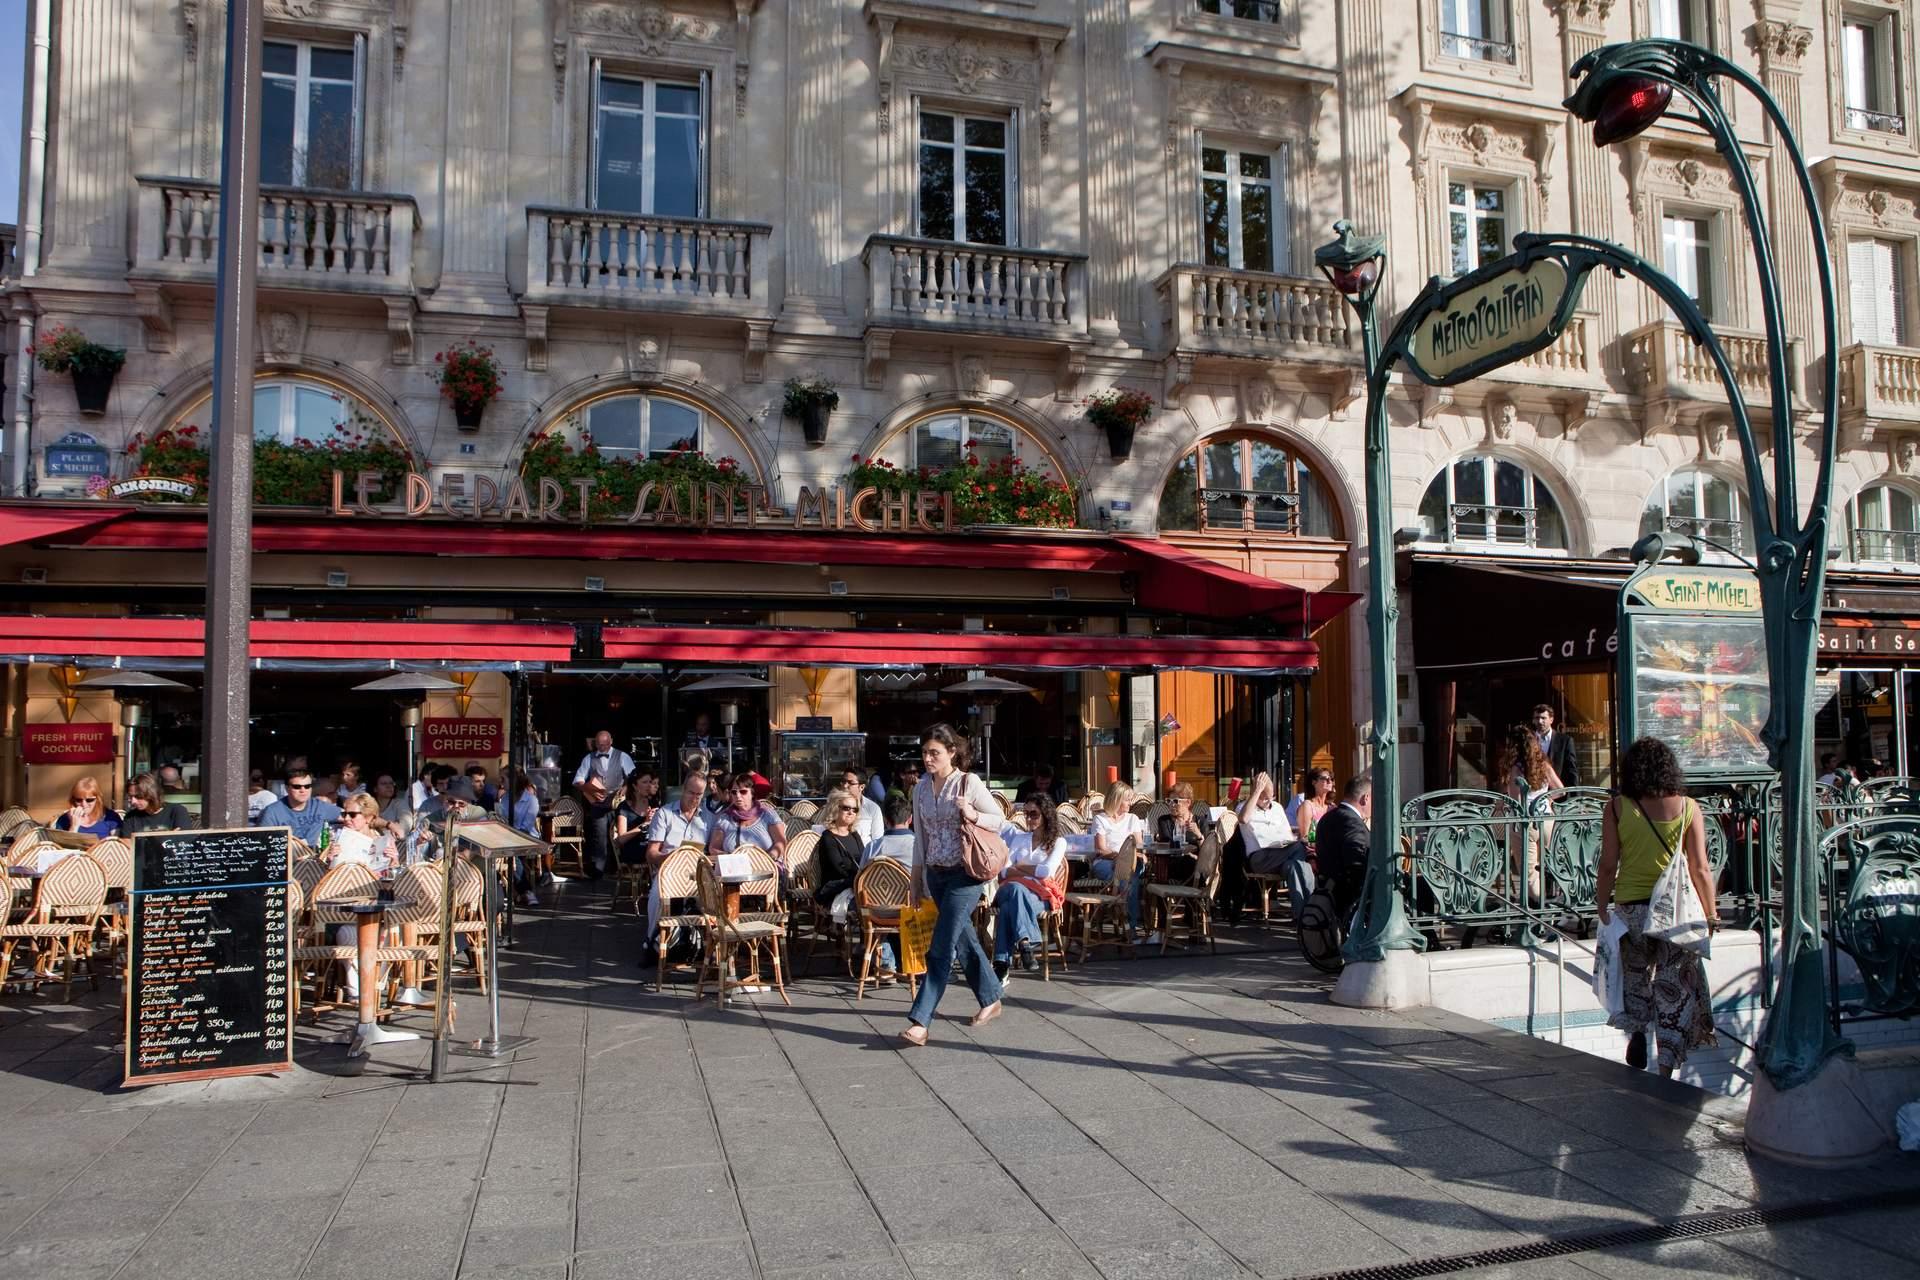 Paris: Cafe bei der Notre Dame